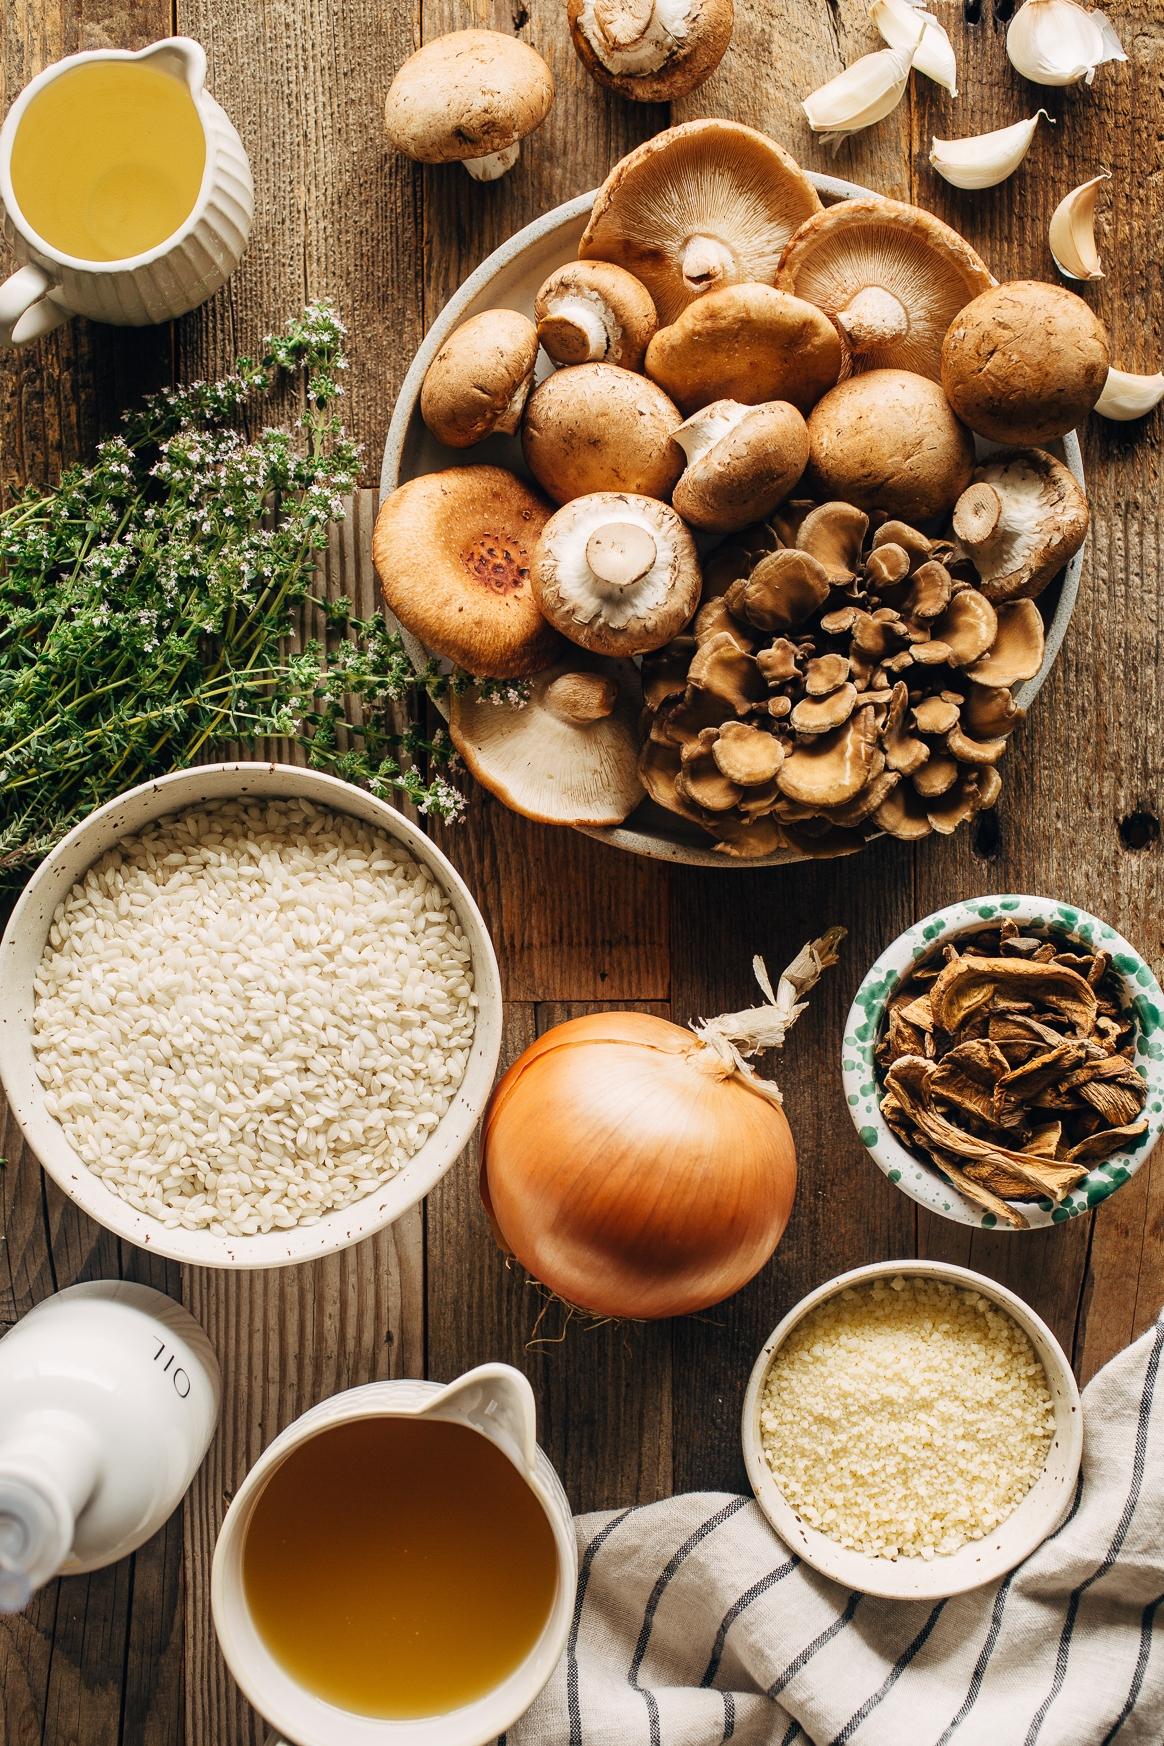 Mushroom Risotto Ingredients